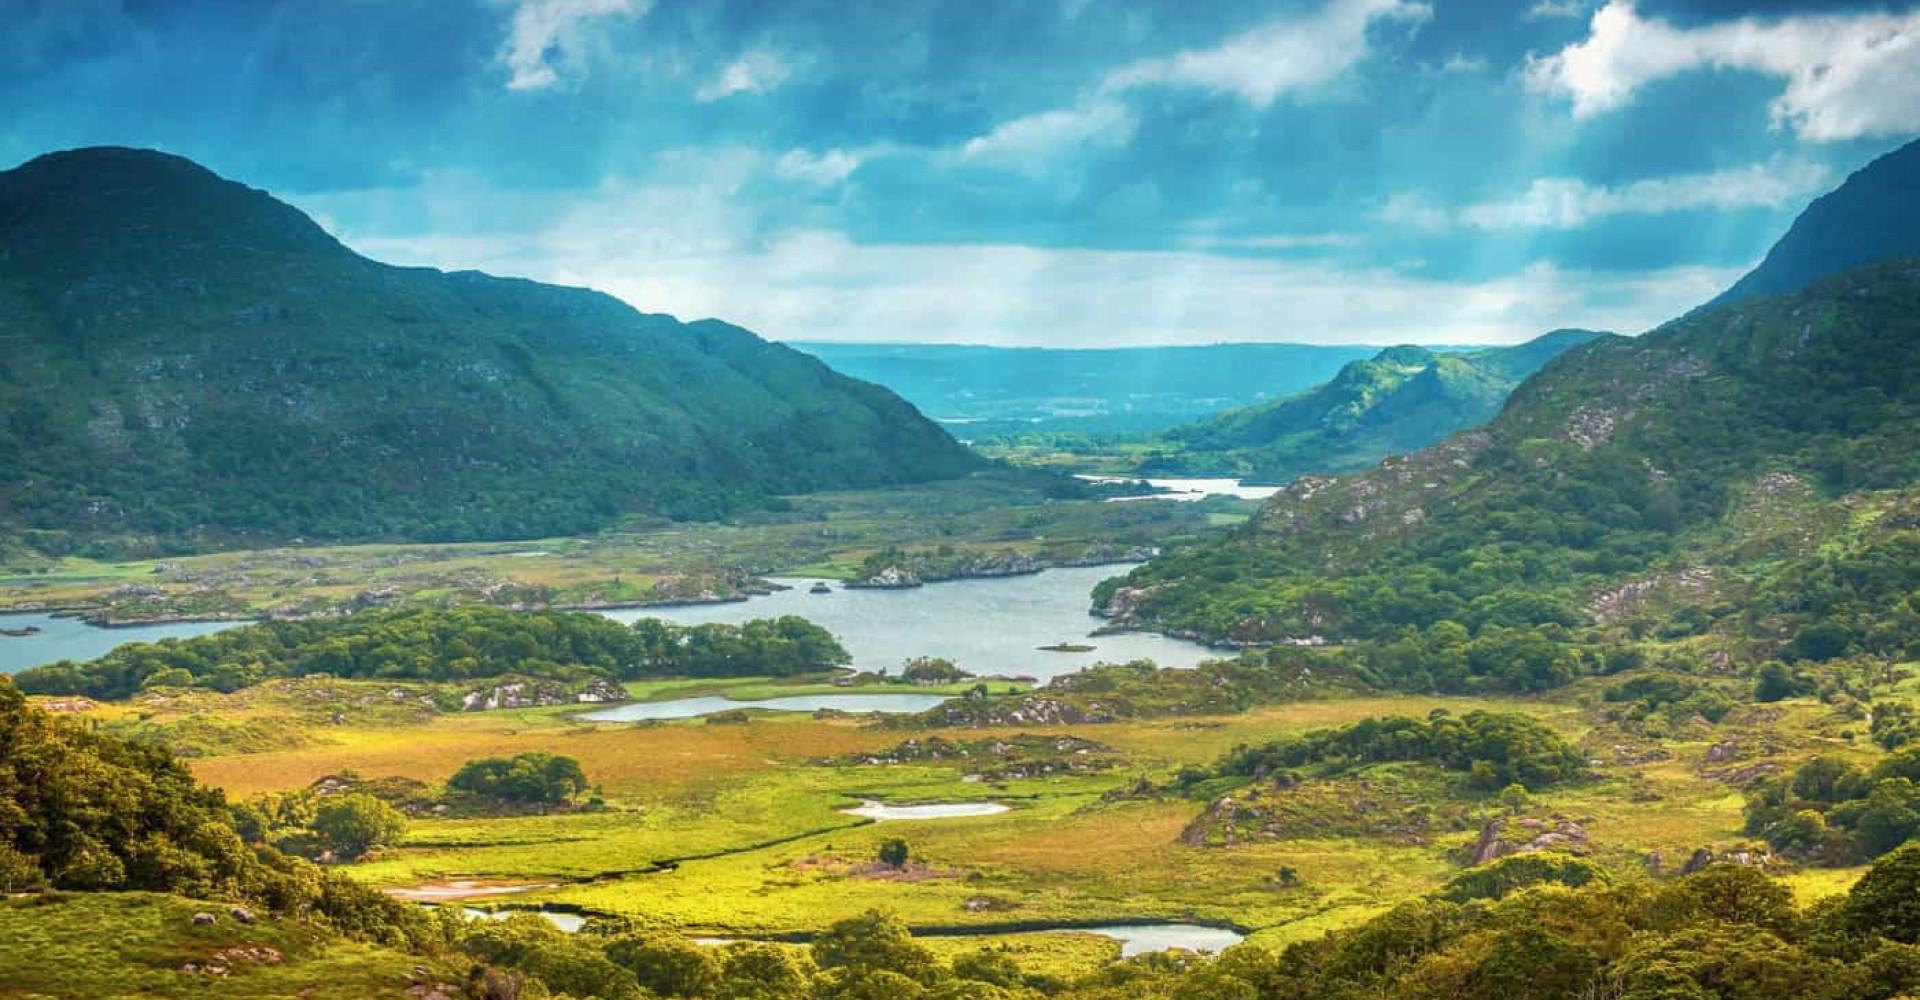 Irlande: l'île verdoyante dans toute sa splendeur